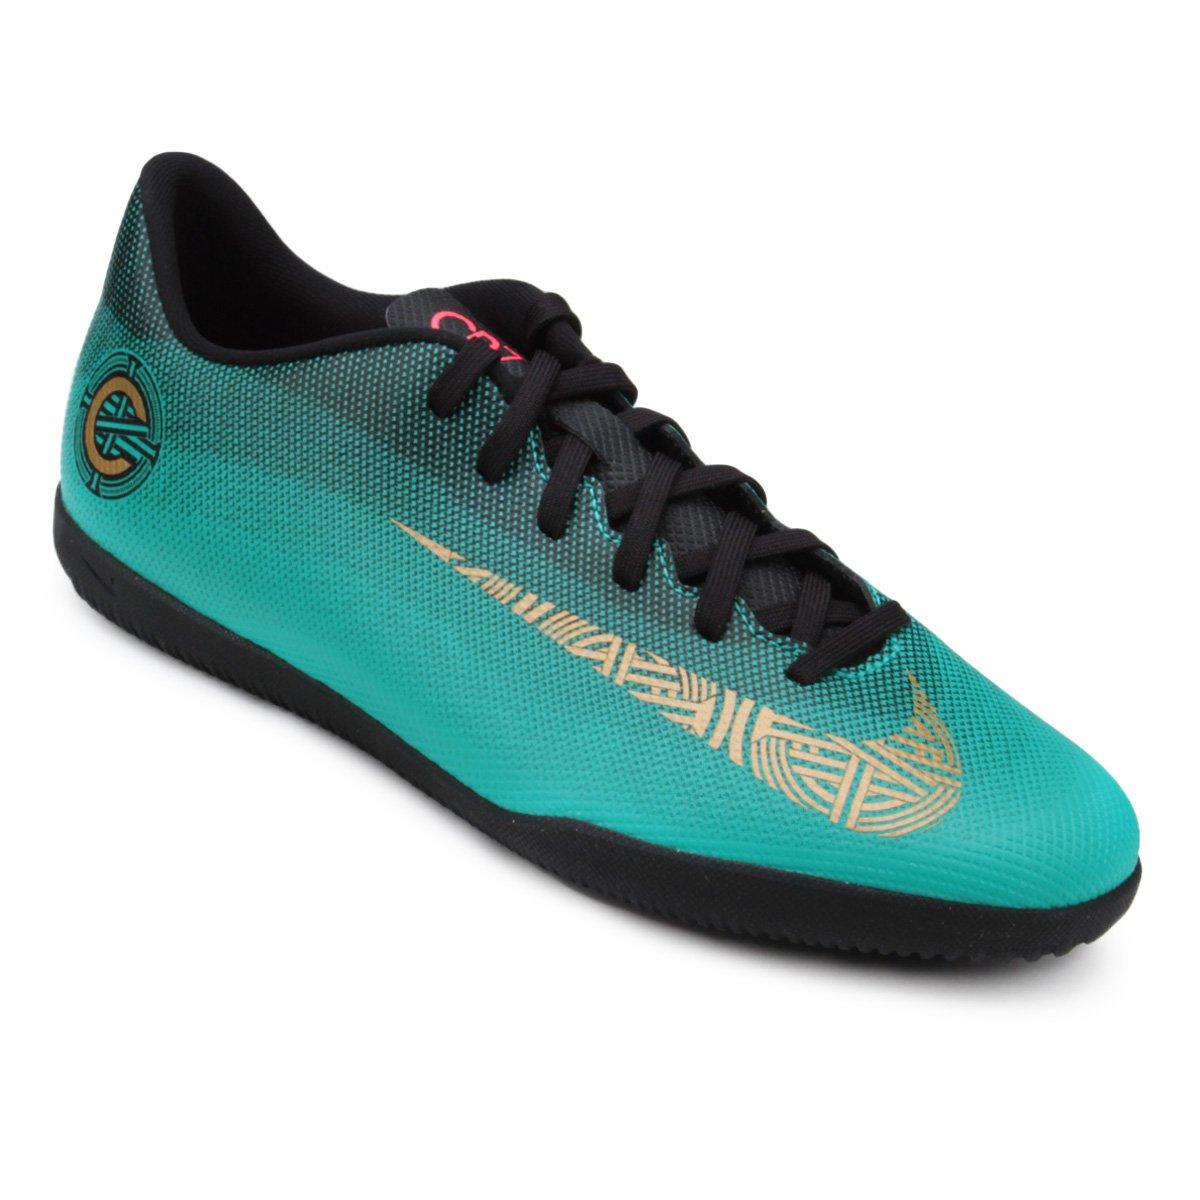 Chuteira Futsal Nike Mercurial Vapor 12 Club CR7 IC - Compre Agora ... e4f62f3723629